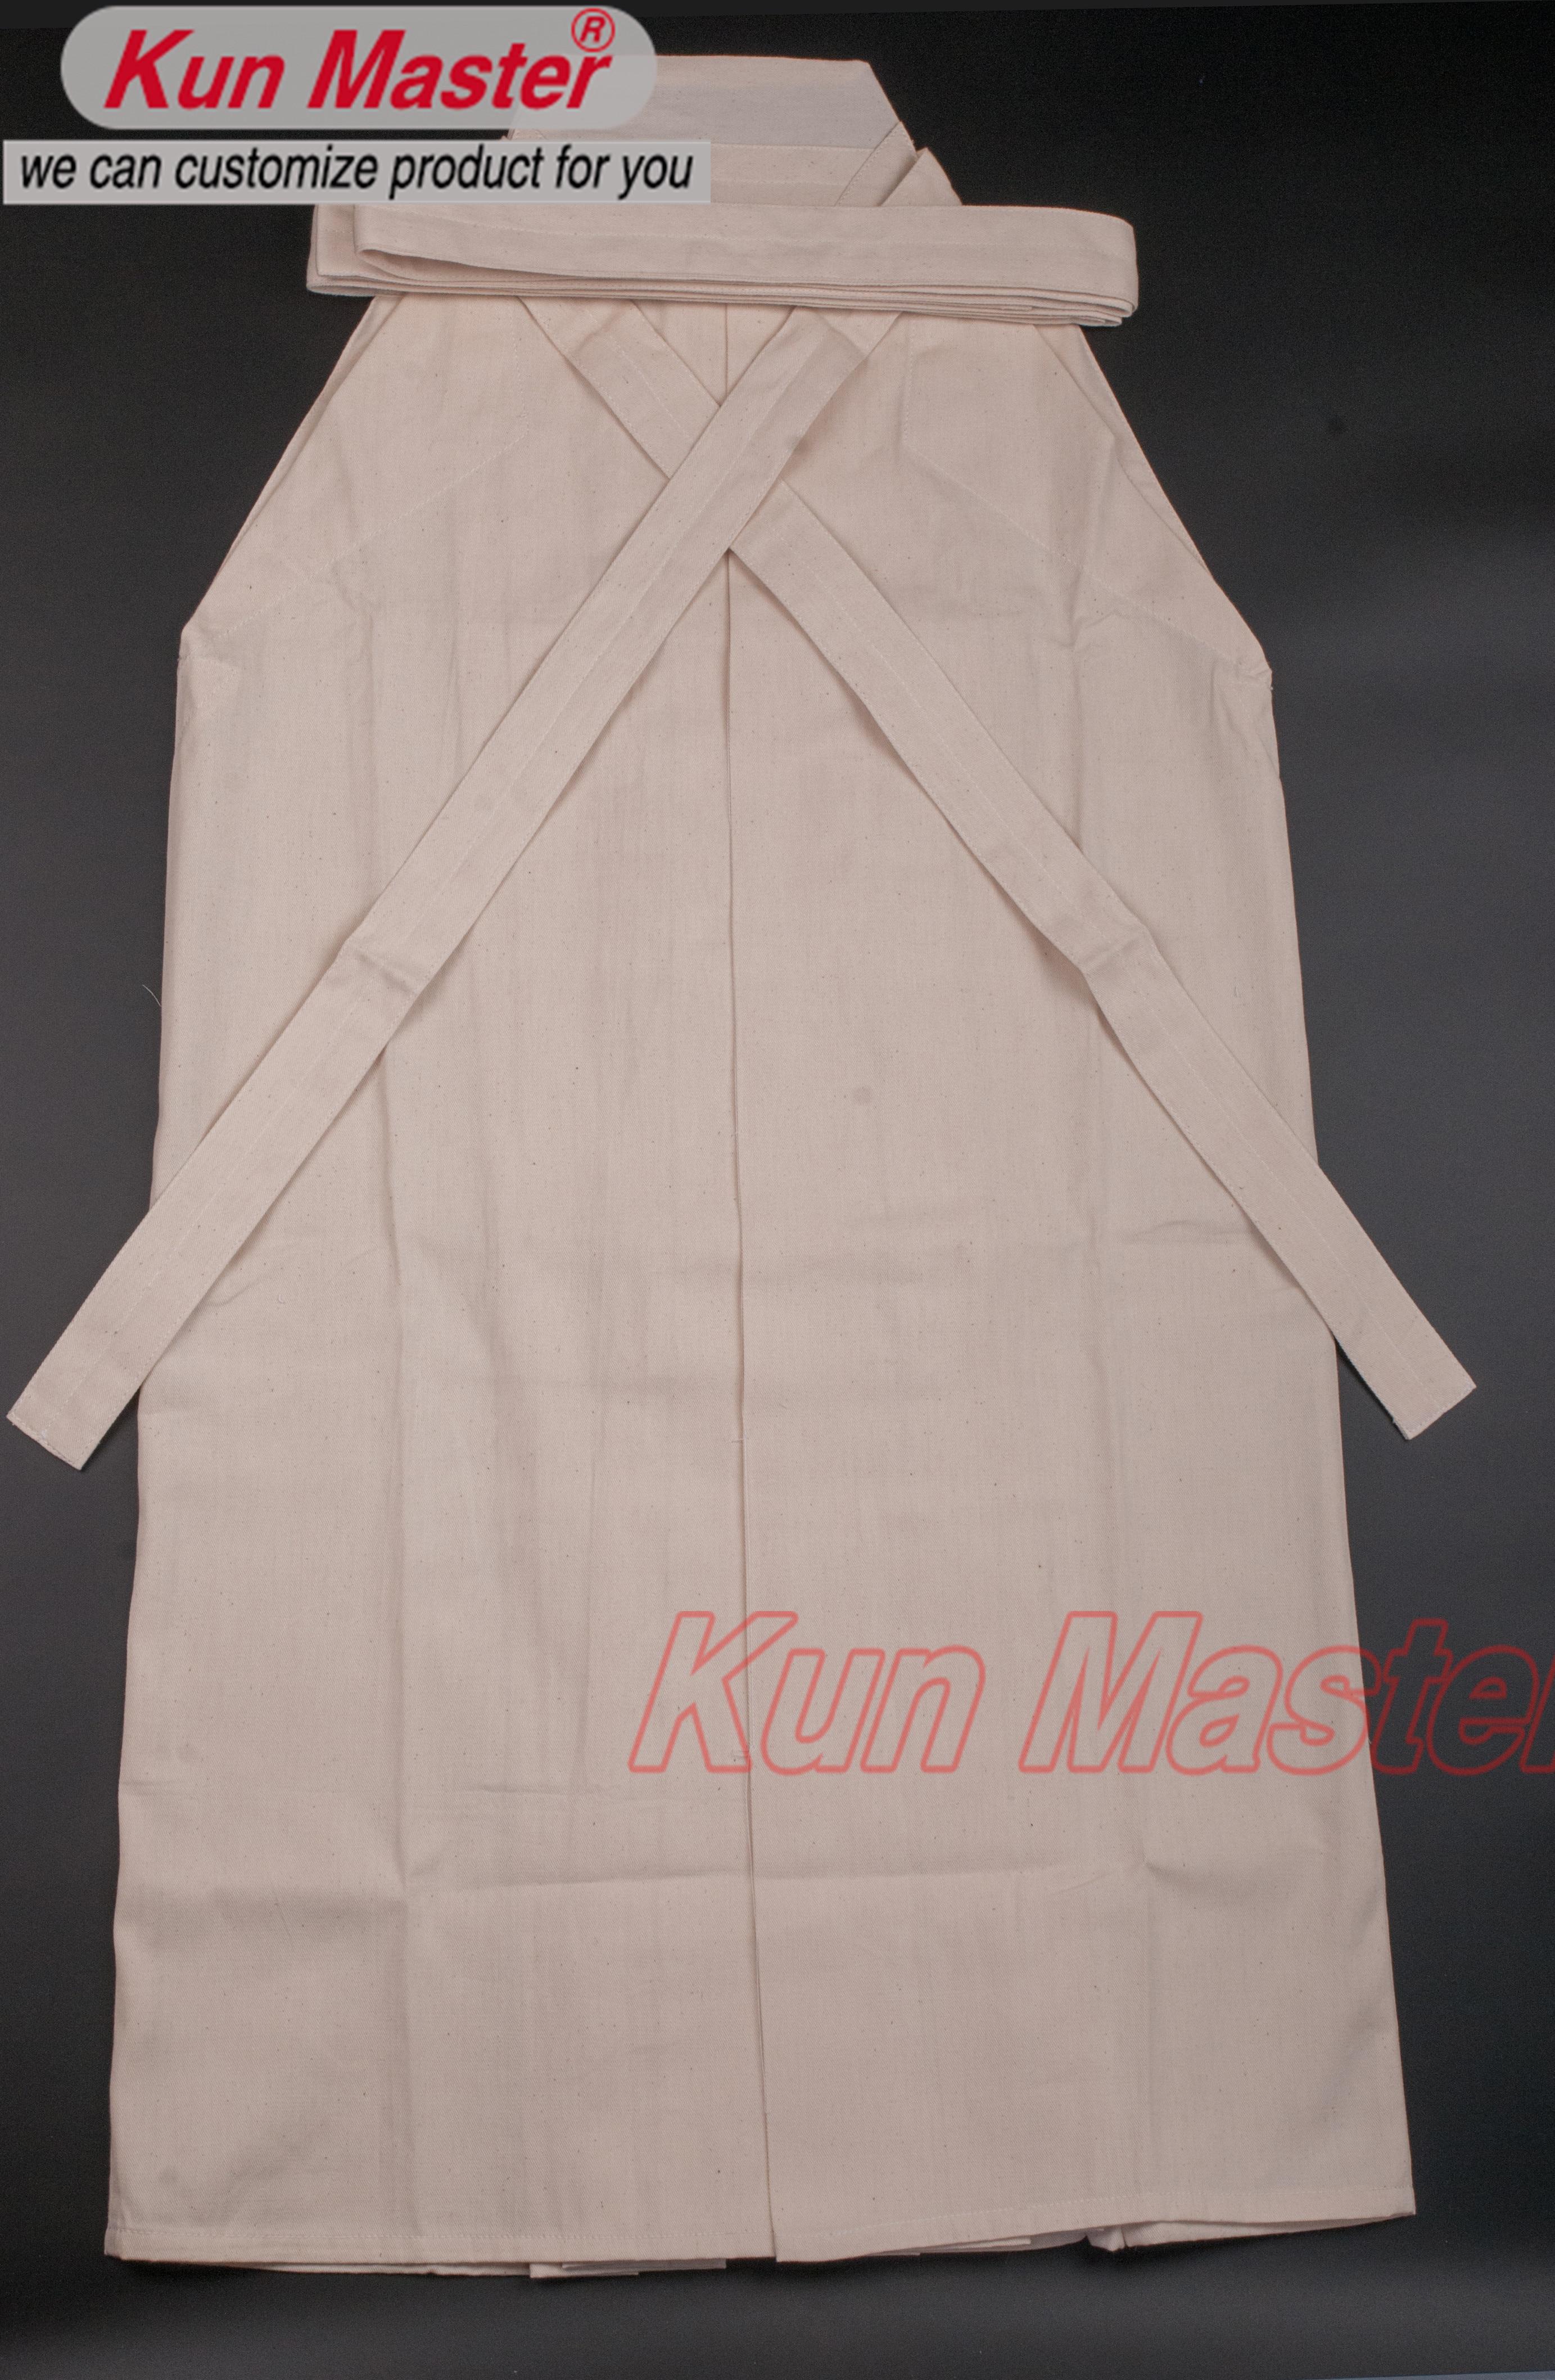 Baumwolle farbe Kendo Uniform, cotten Hakama, Japanischen Traditionellen Hakama (Top Hakama)